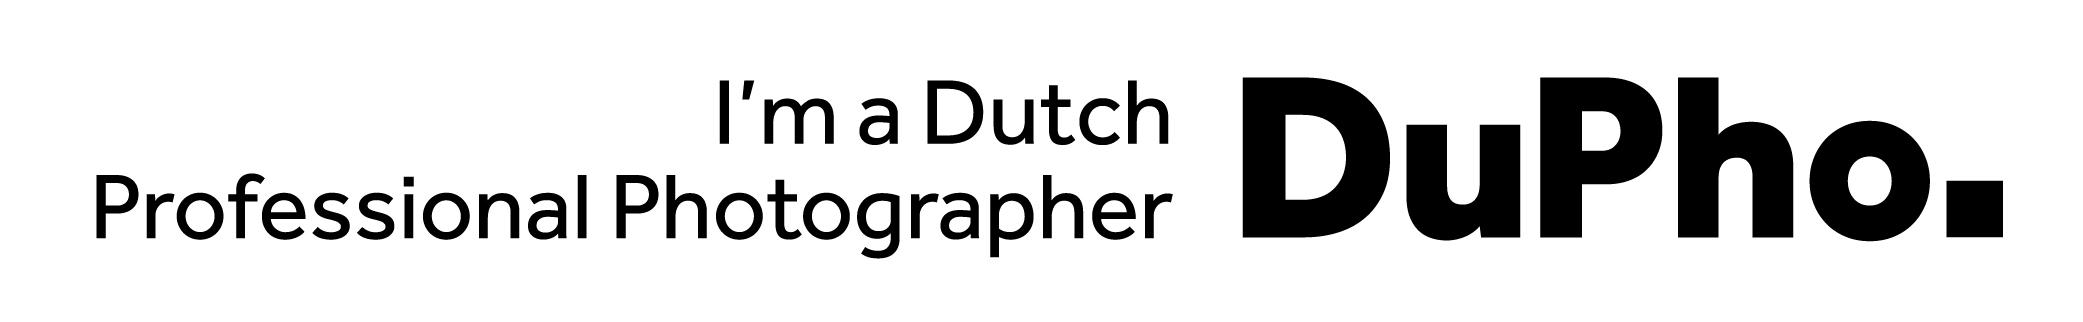 DuPho fotograaf | Kempff Fotografie